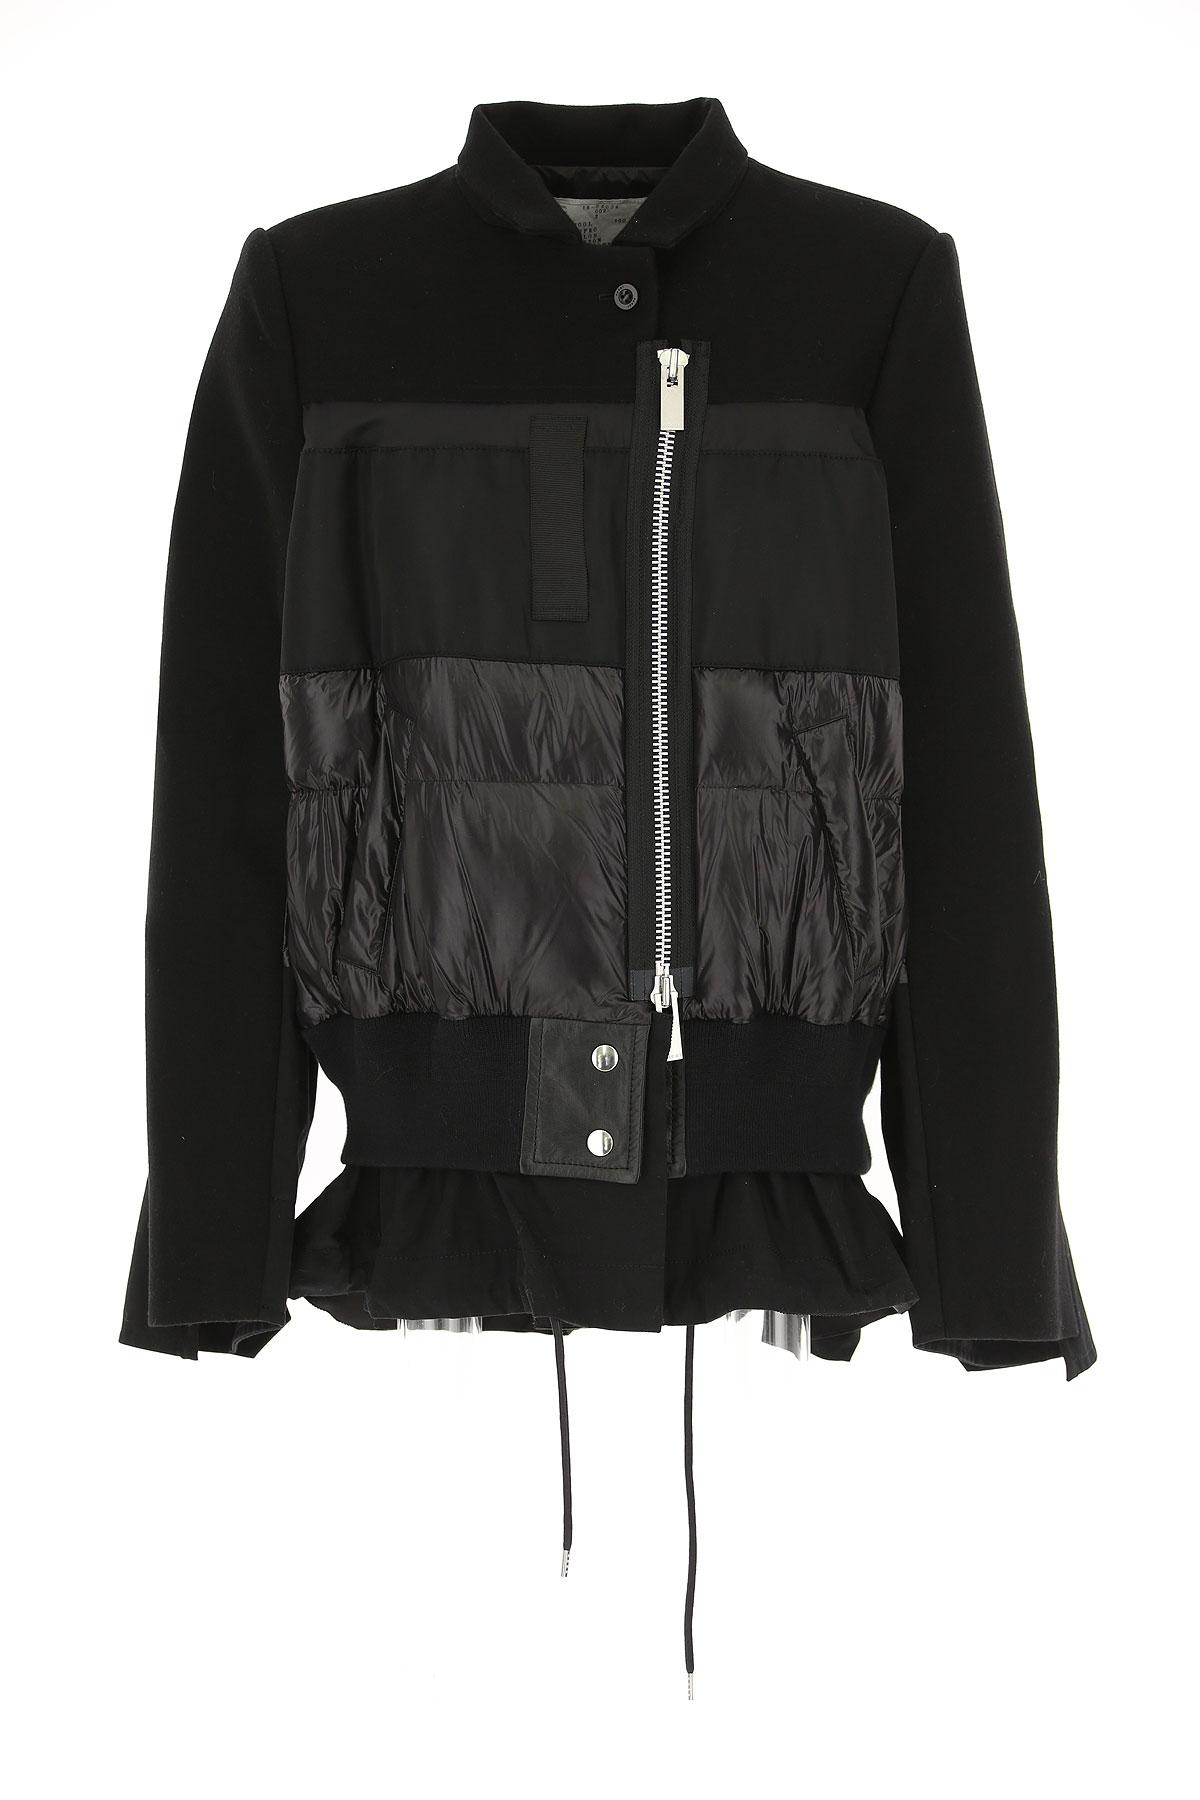 Image of Sacai Down Jacket for Women, Puffer Ski Jacket, Black, Nylon, 2017, US 2 - UK 6 - EU 36 - IT 40 US 4 - UK 8 - EU 38 - IT 42